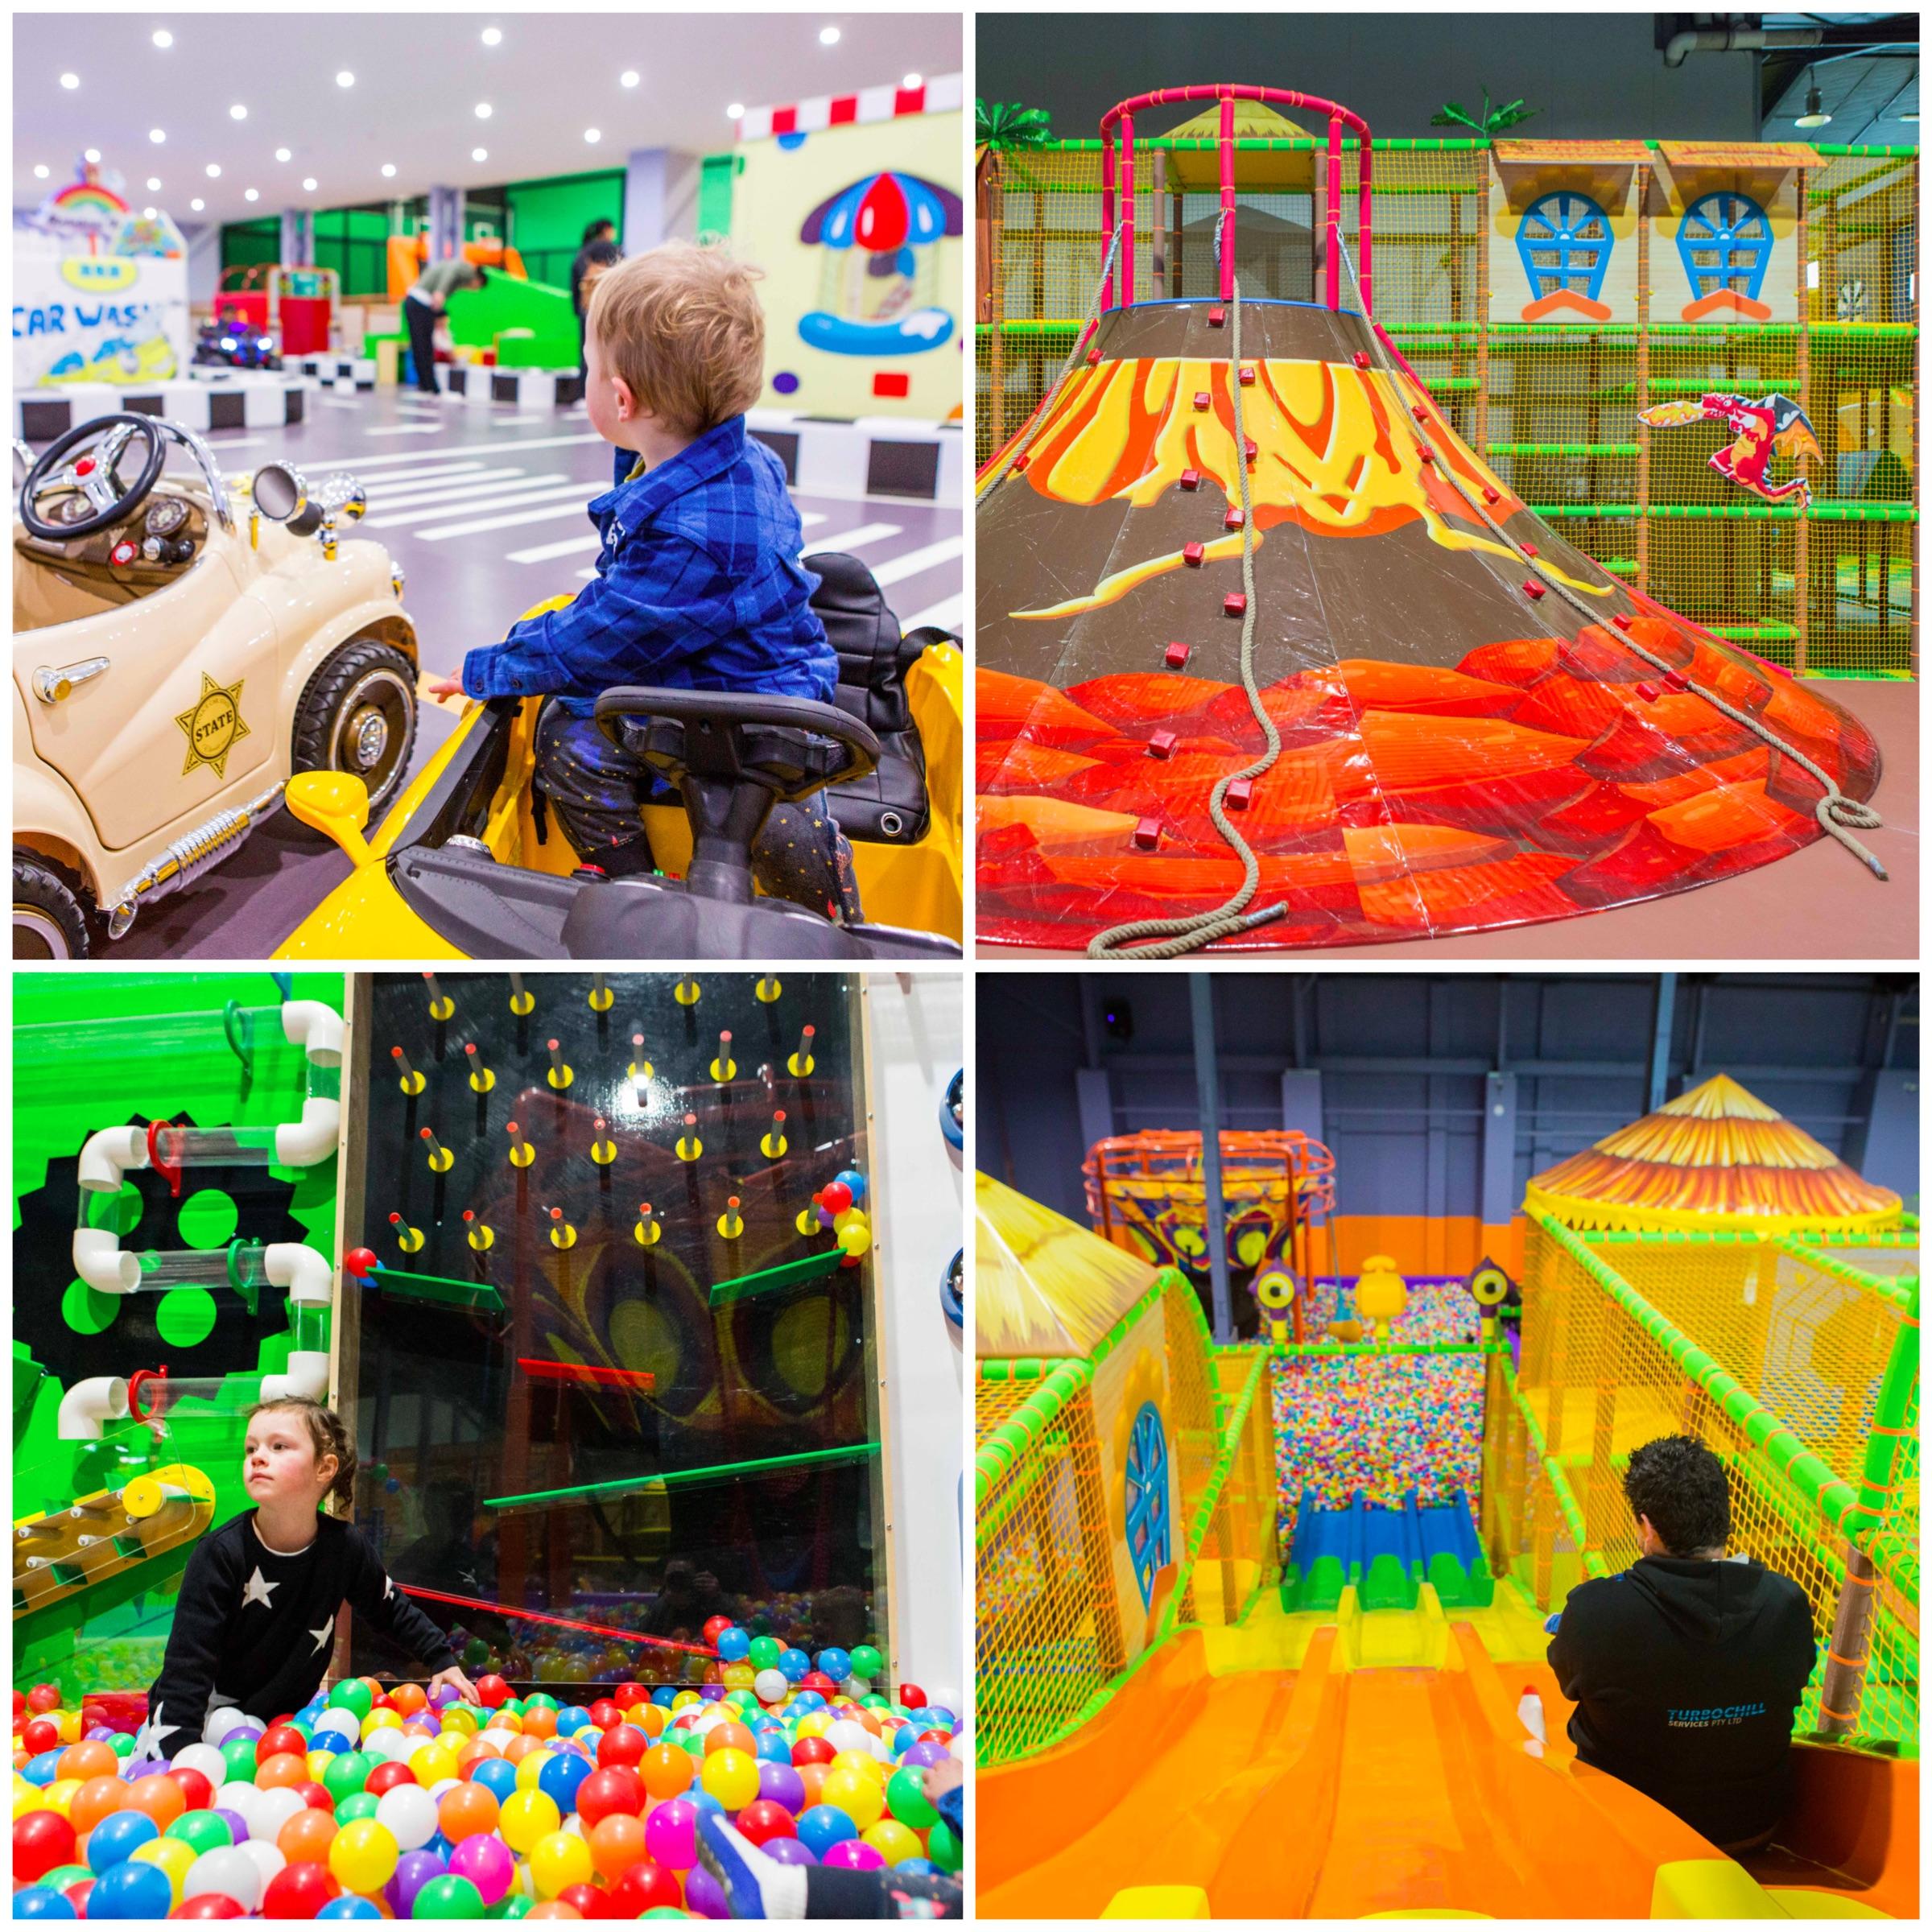 03 Rainbow Town Playcentre Glen Waverley - Mamma Knows East (1 of 2).jpg